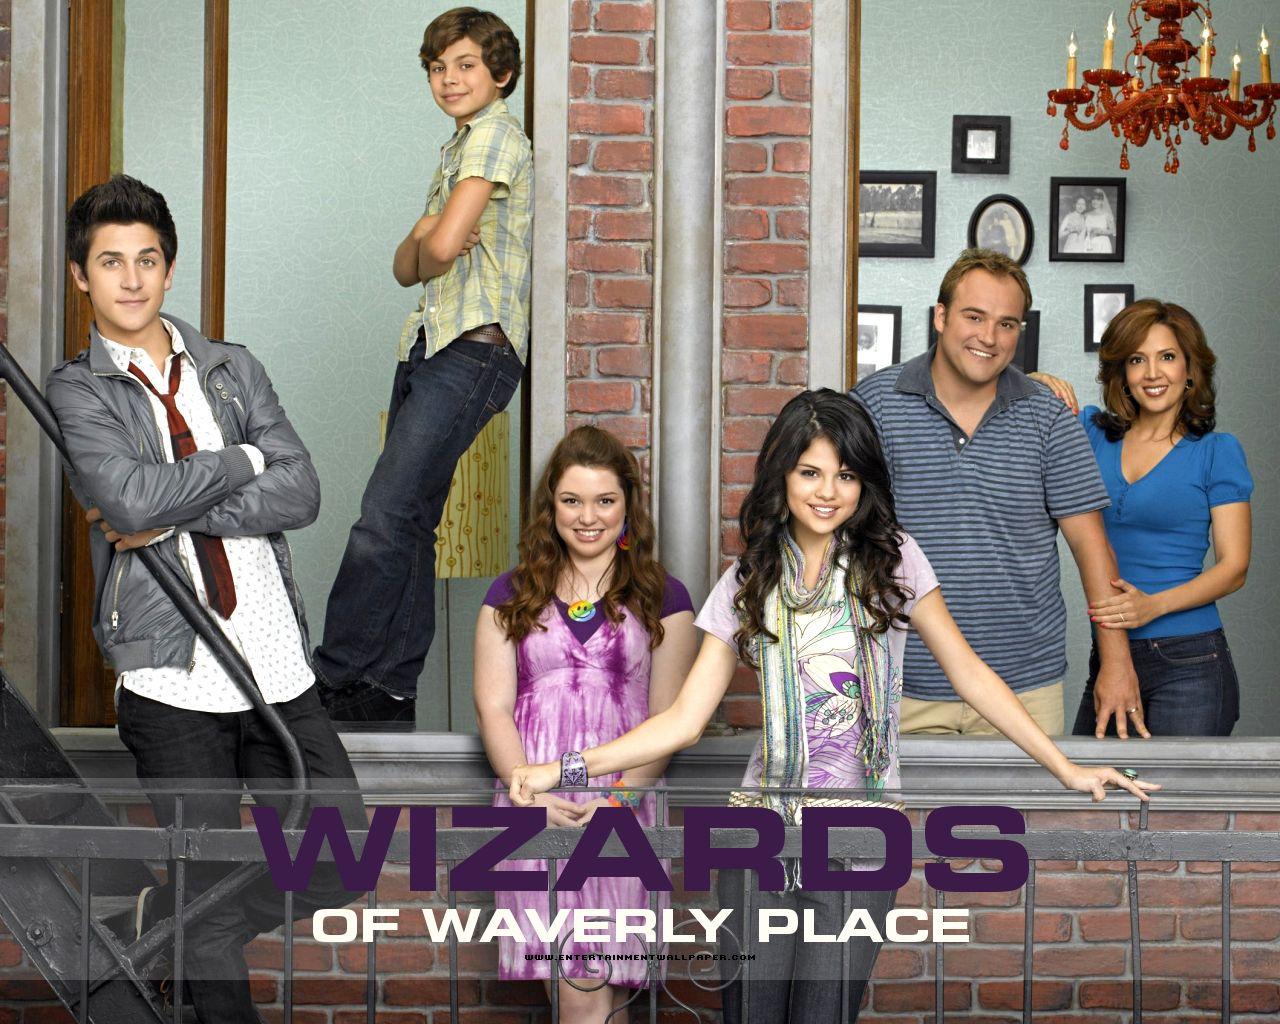 http://2.bp.blogspot.com/-W_nt4-W3x9k/T4f5XxUcTSI/AAAAAAAAAC8/GkK3CyAWso4/s1600/tv_wizards_of_waverly_place05.jpg